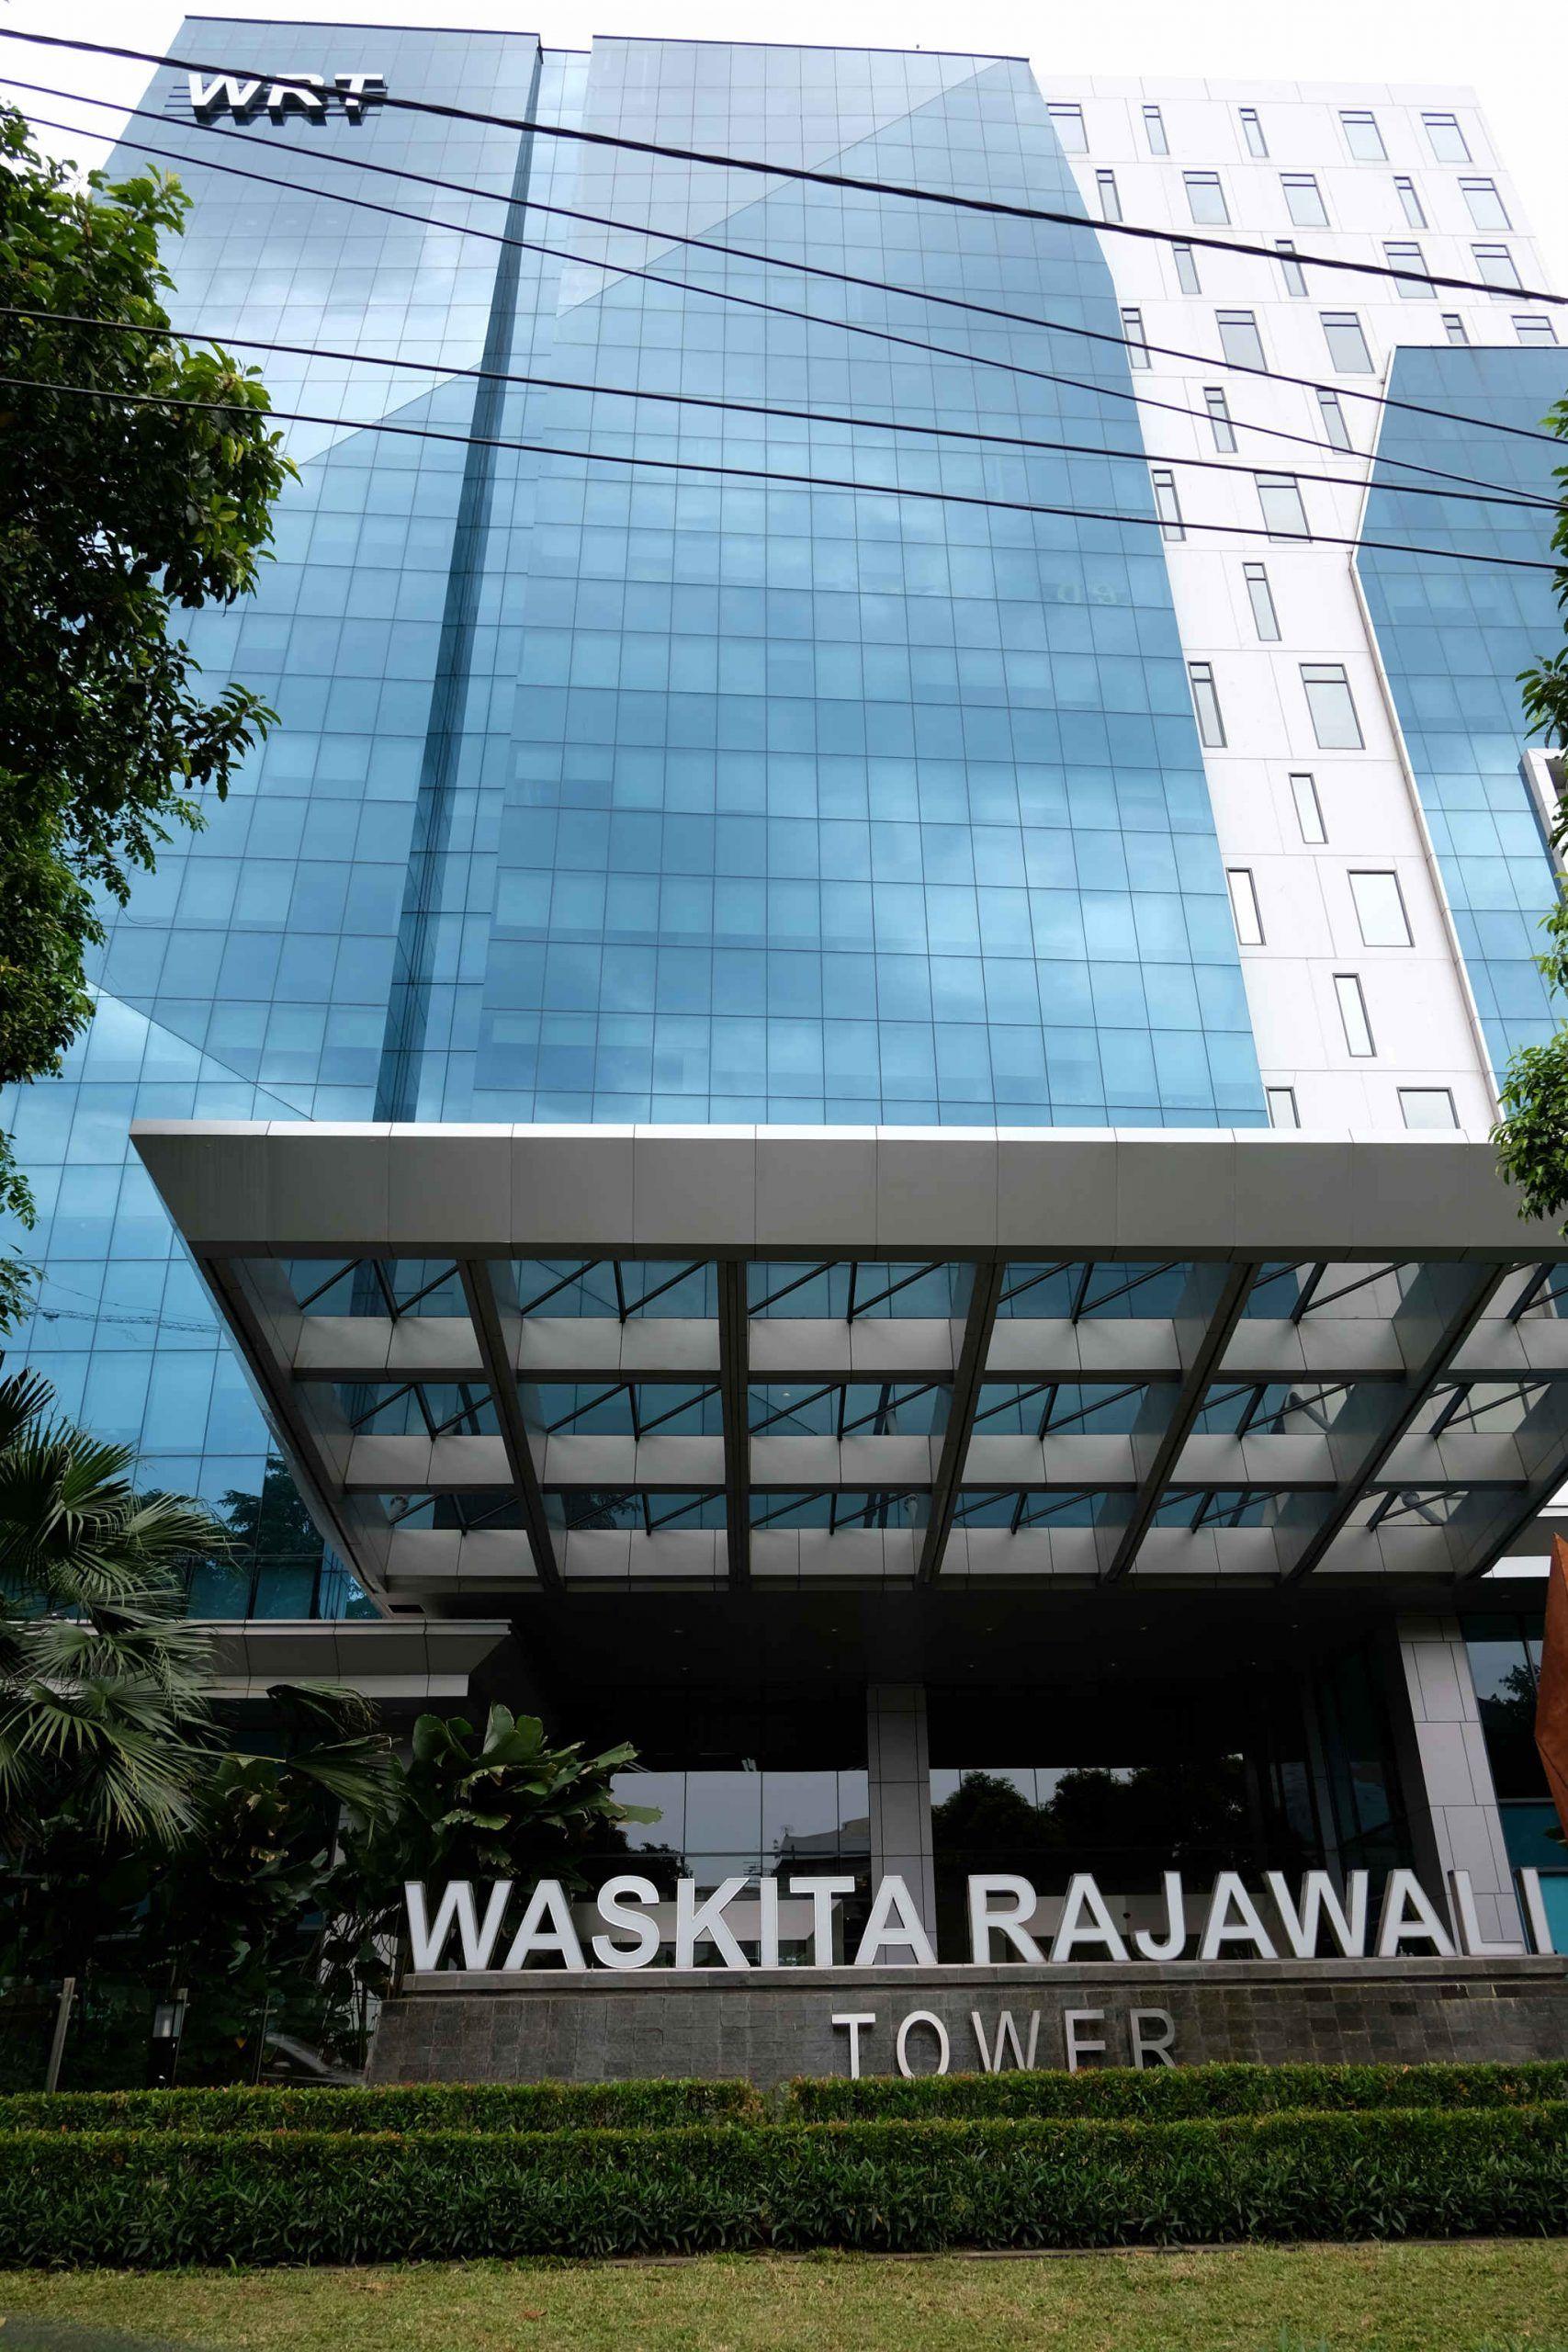 waskita-karya-refocusing-bisnis-ke-jasa-konstruksi-kurangi-proyek-jalan-tol